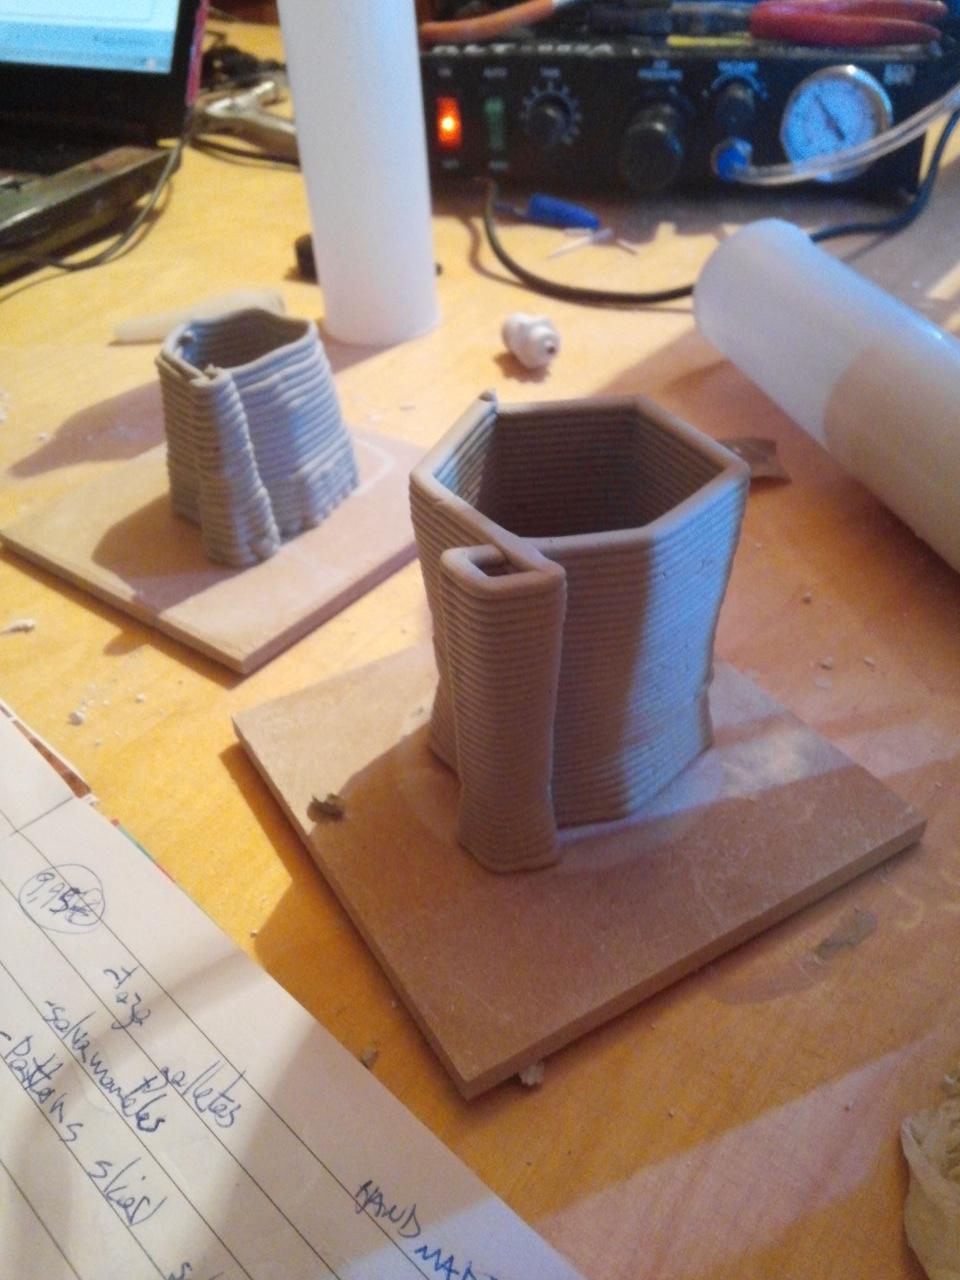 3d printed cup test